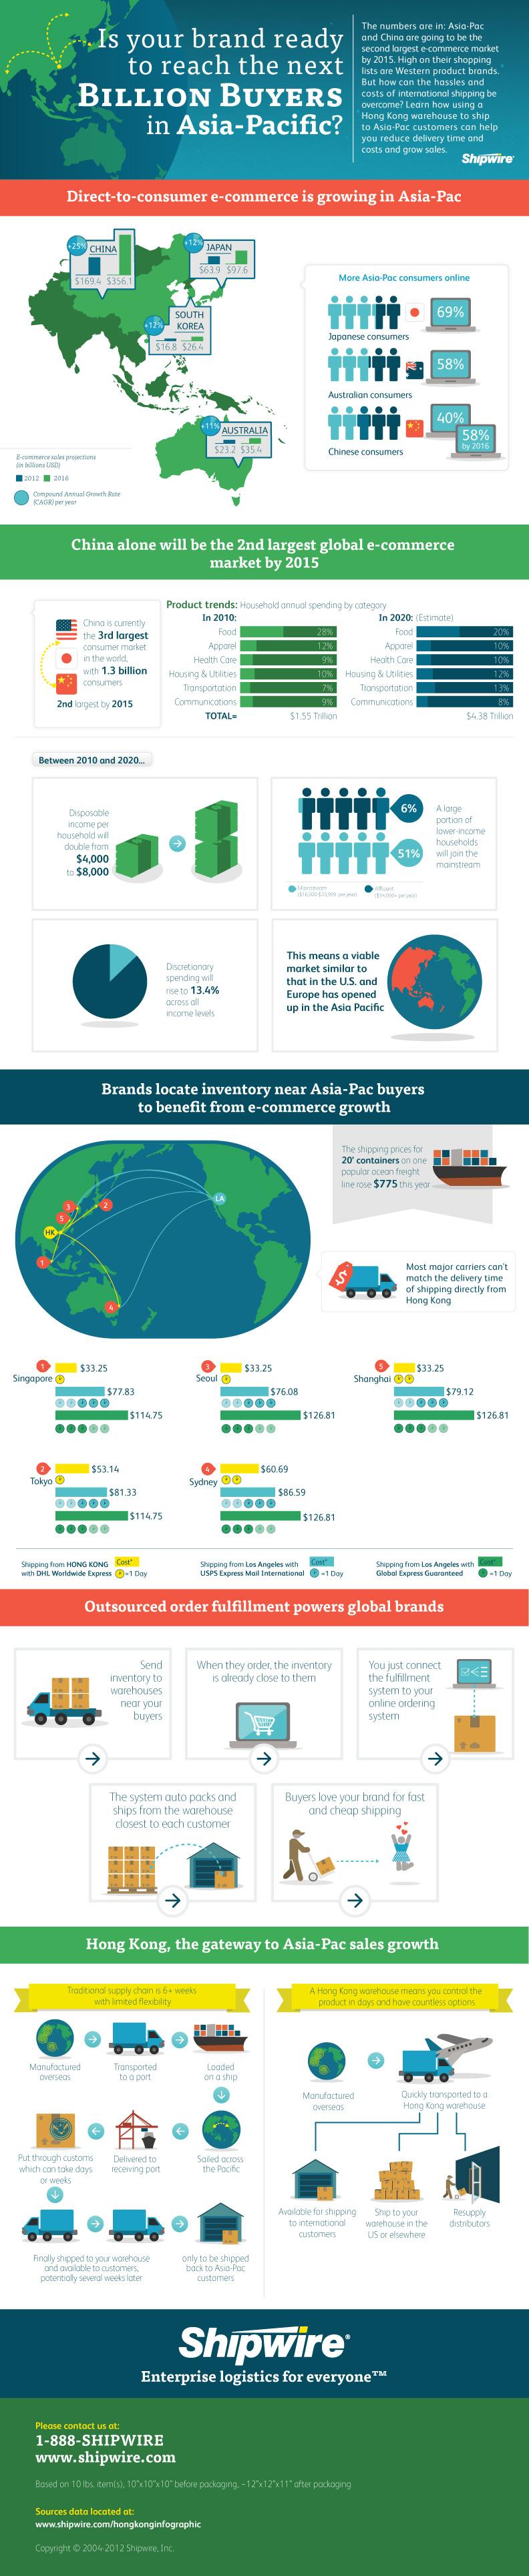 Asia Pacific Market